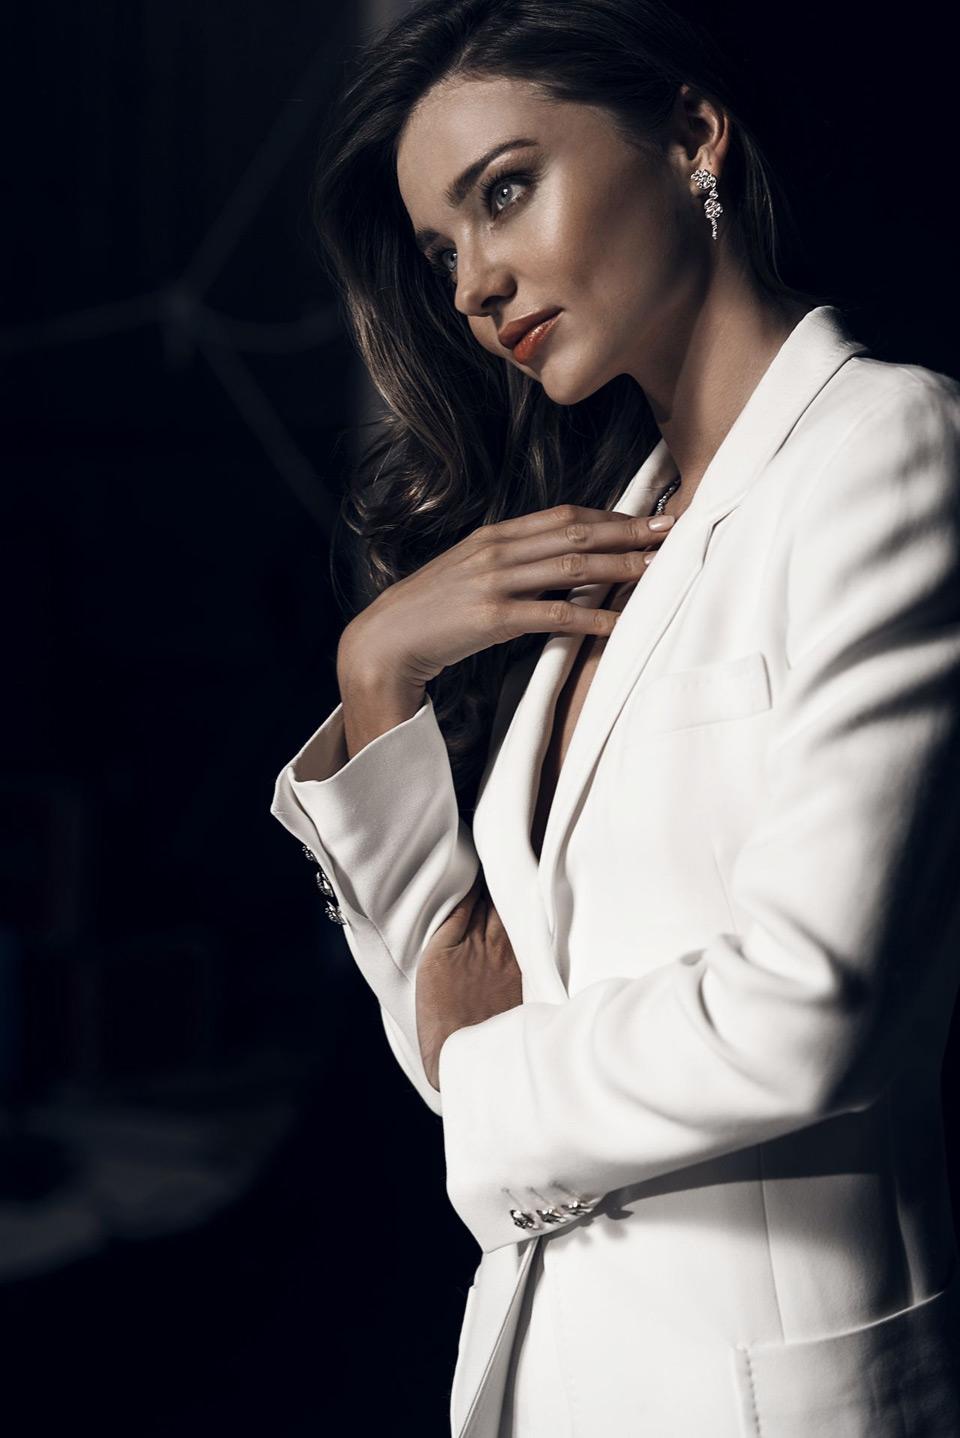 Миранда Керр в рекламе Swarovski (7 фото) — FotoJoin миранда керр вк